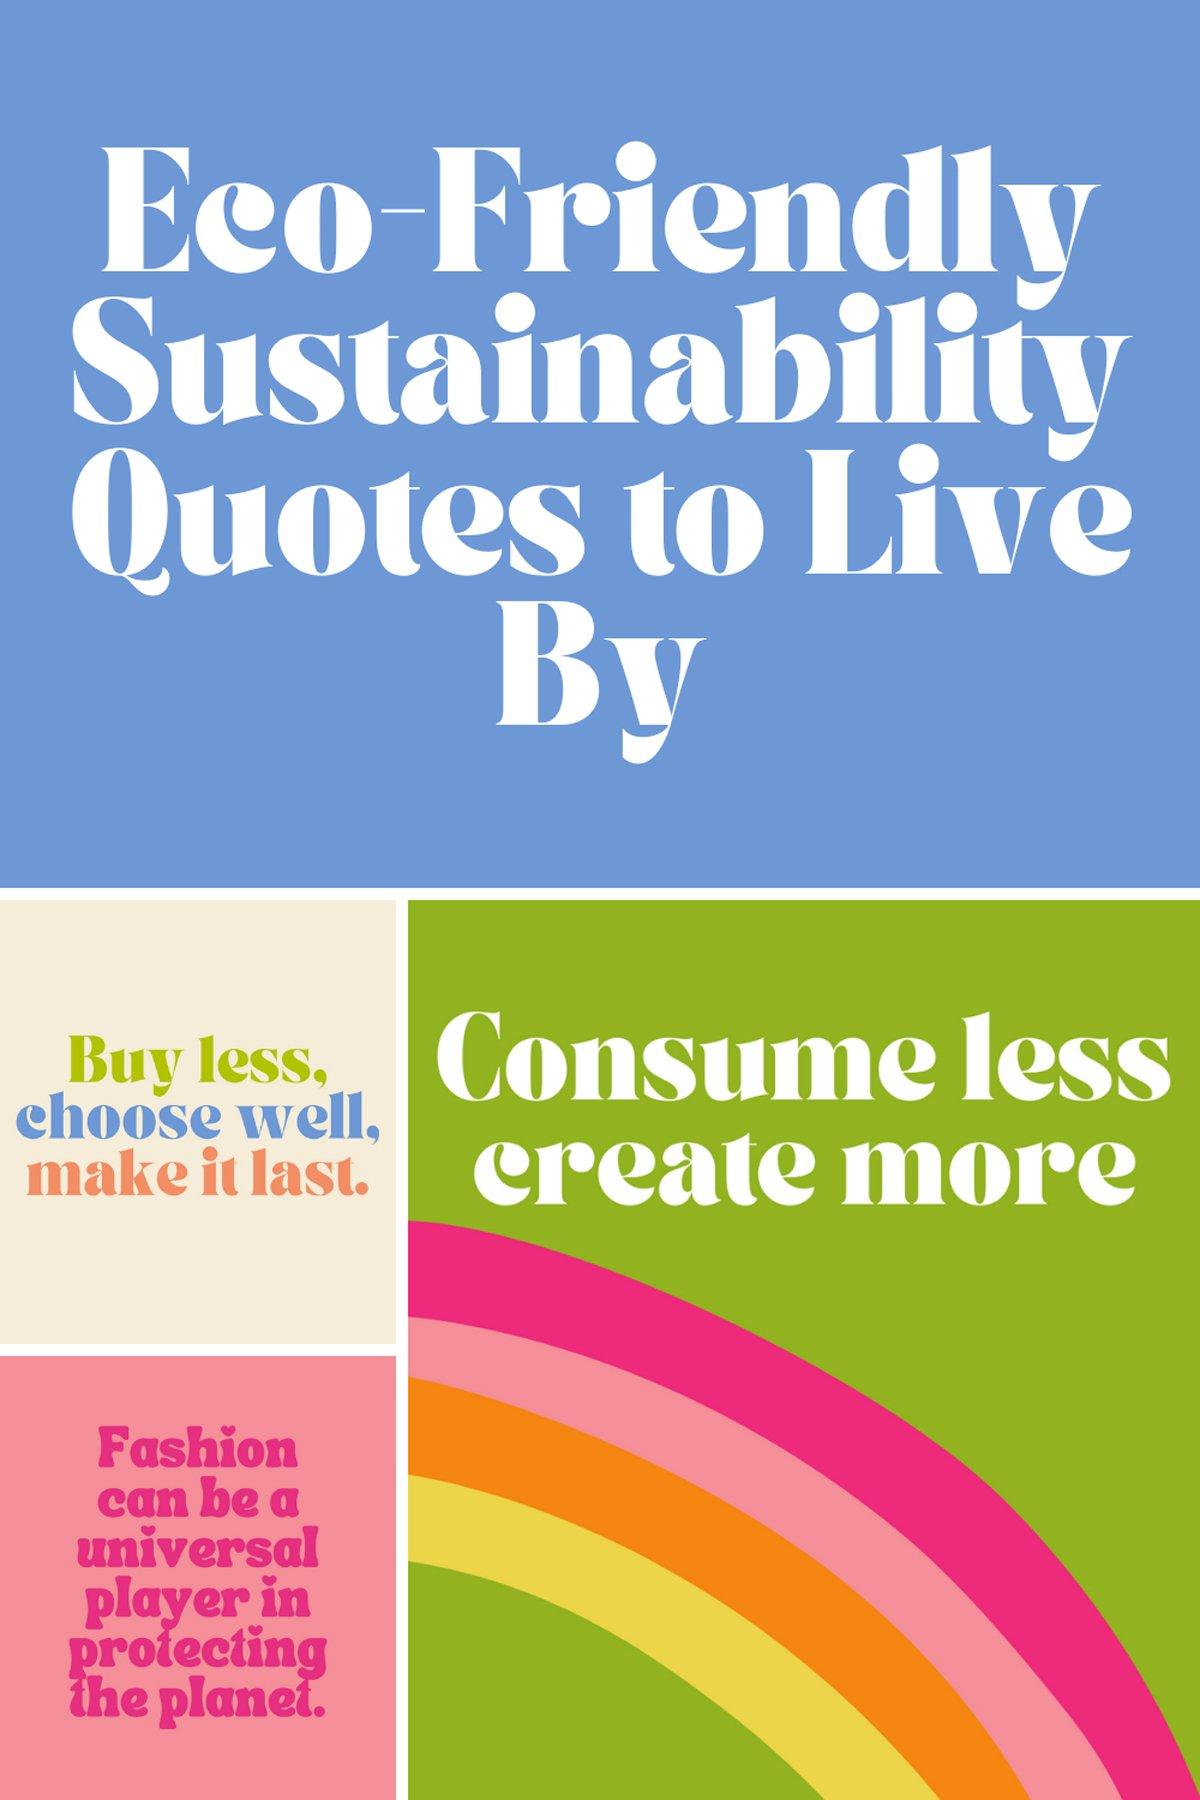 Eco Friendly Lifestyle Quotes